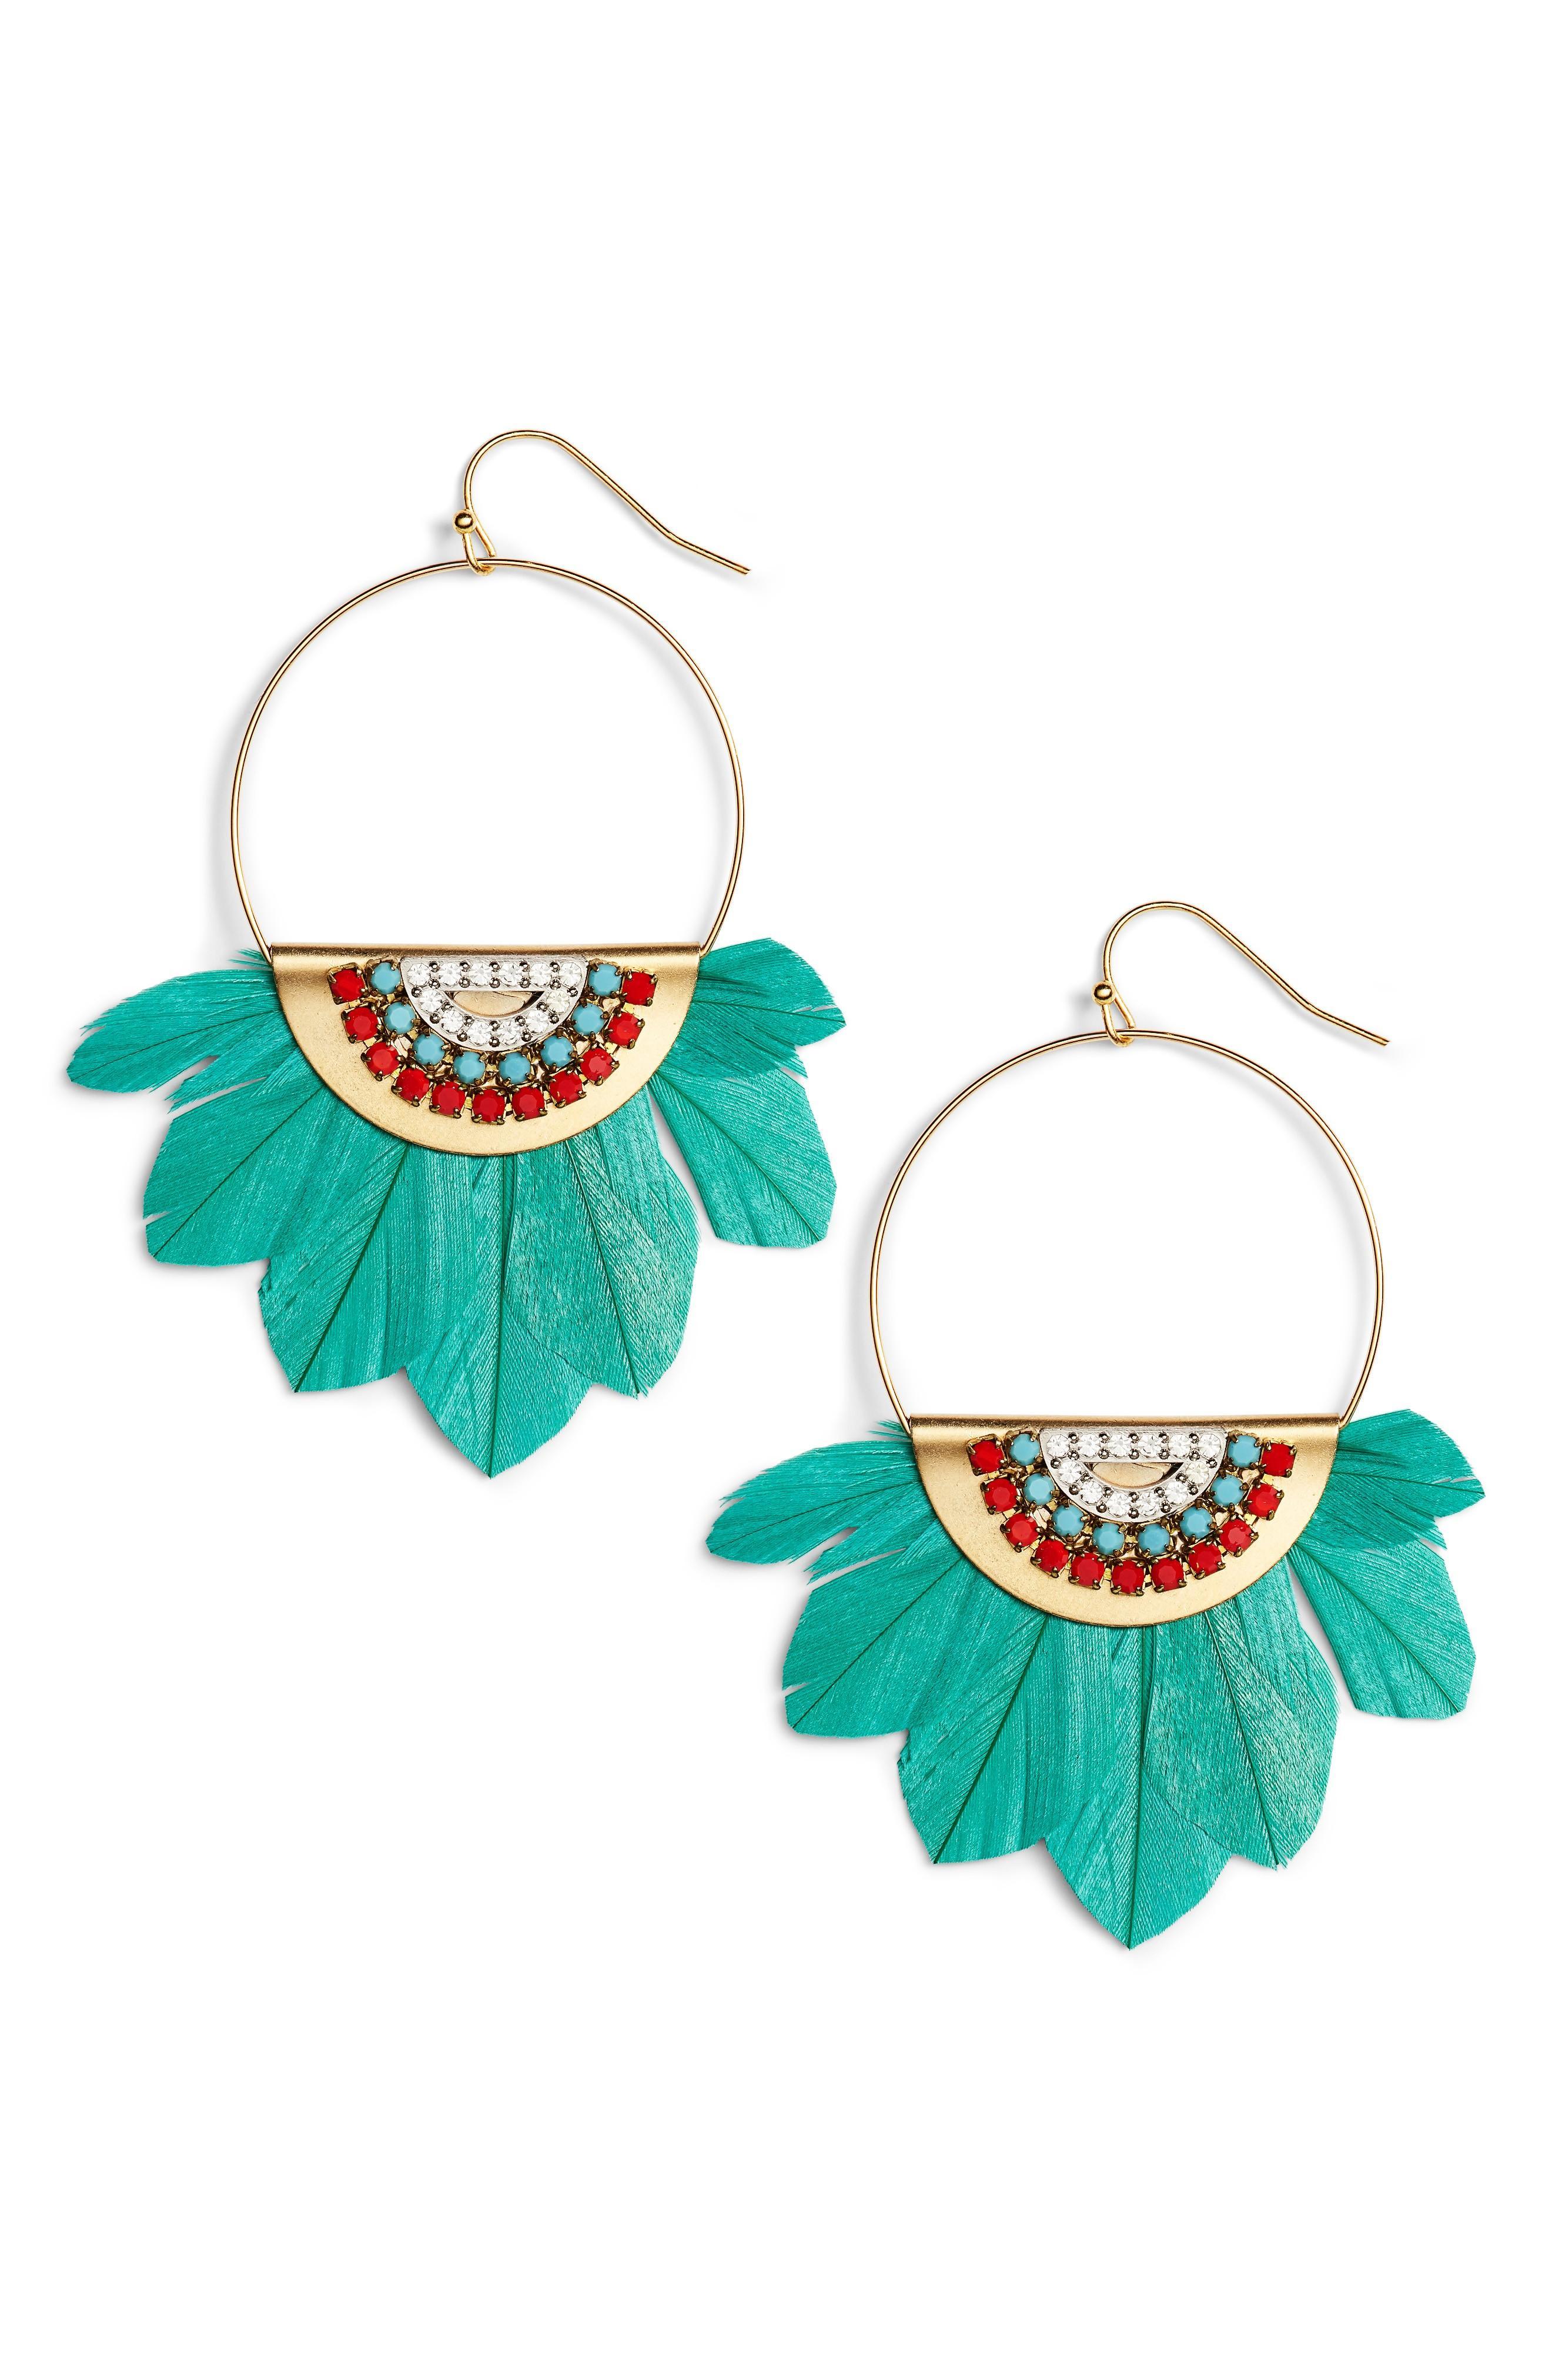 Sandy Hyun Tulum Feather Hoop Earrings In Turquoise